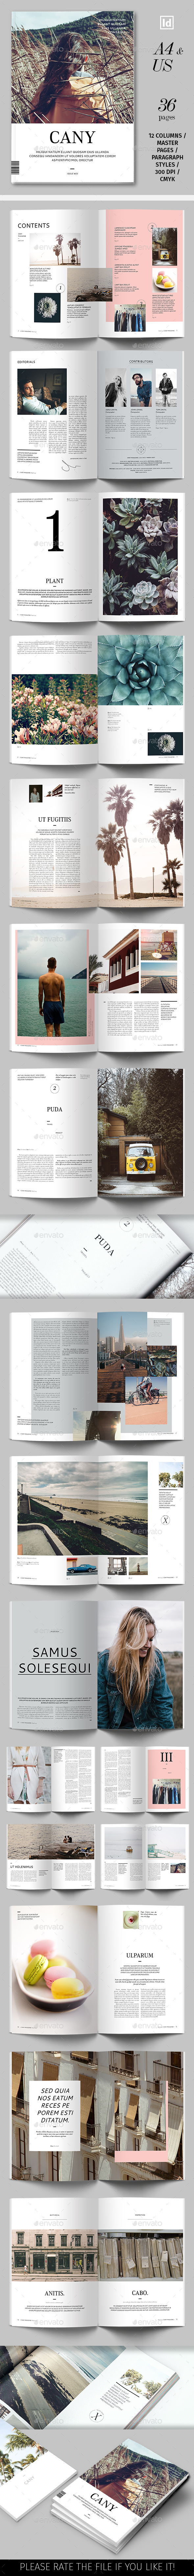 Cany Magazine Template - Magazines Print Templates